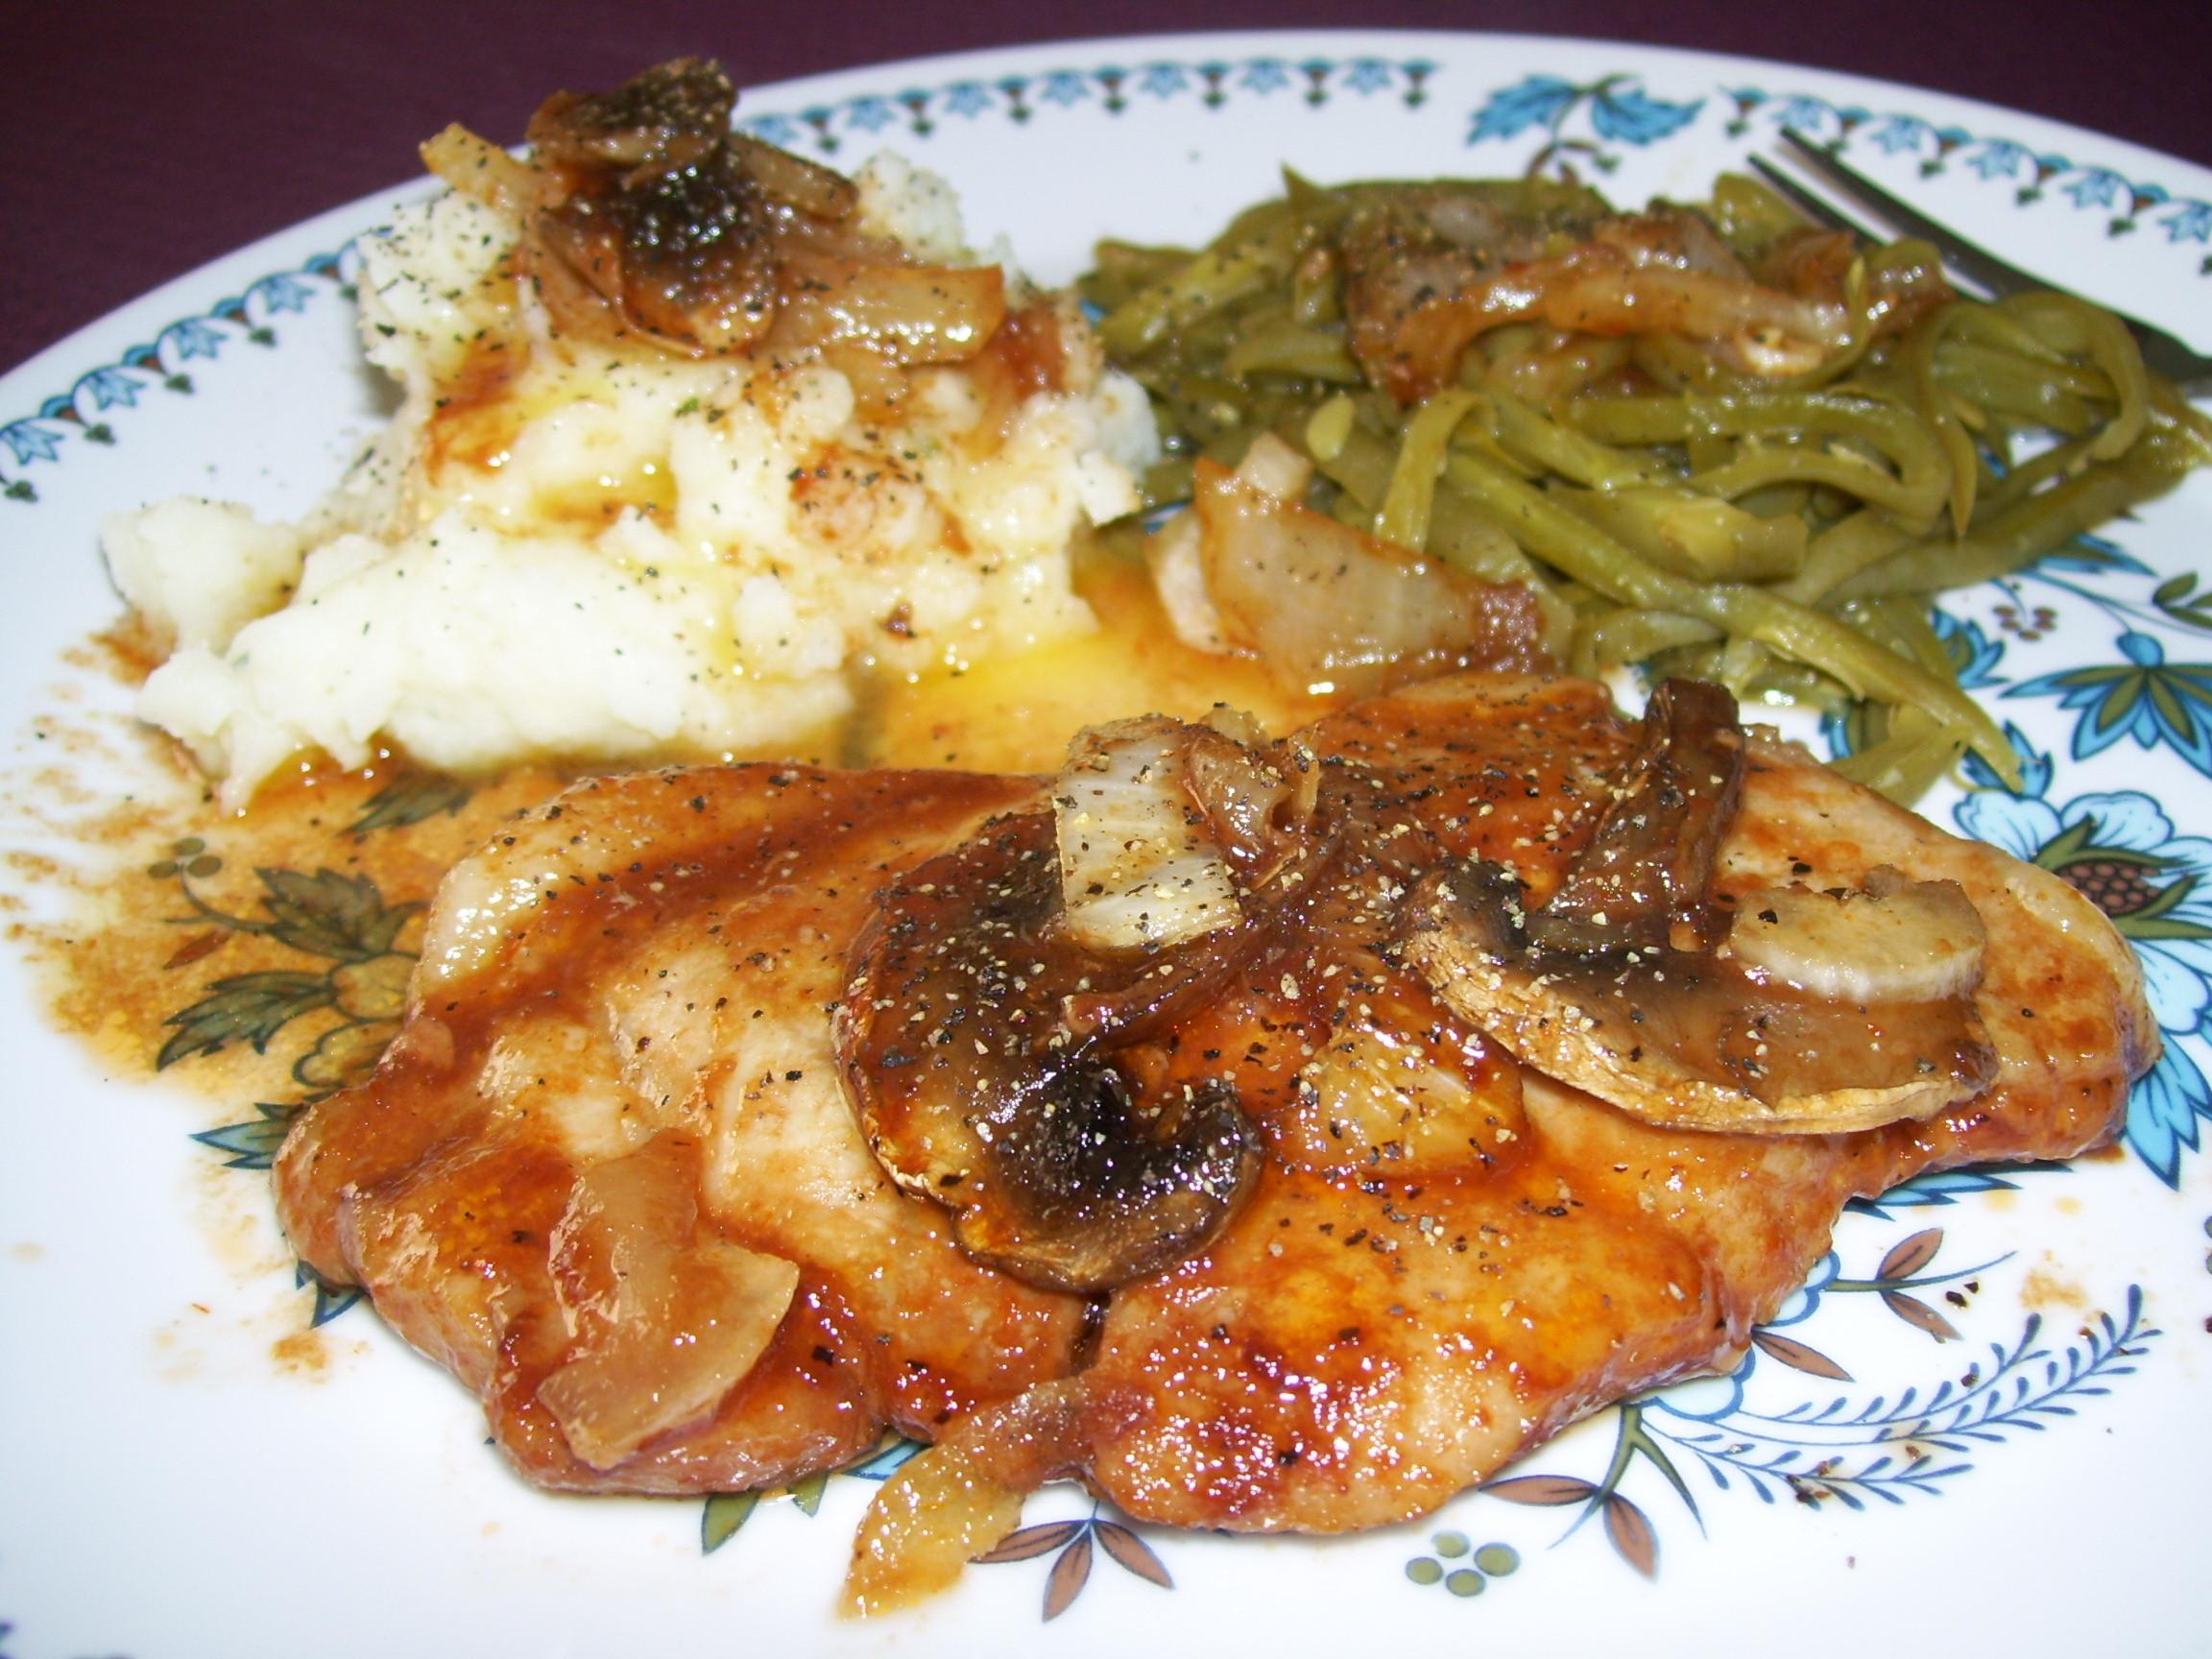 Pork Chop Dinners  Saucy Pork Chop Dinner